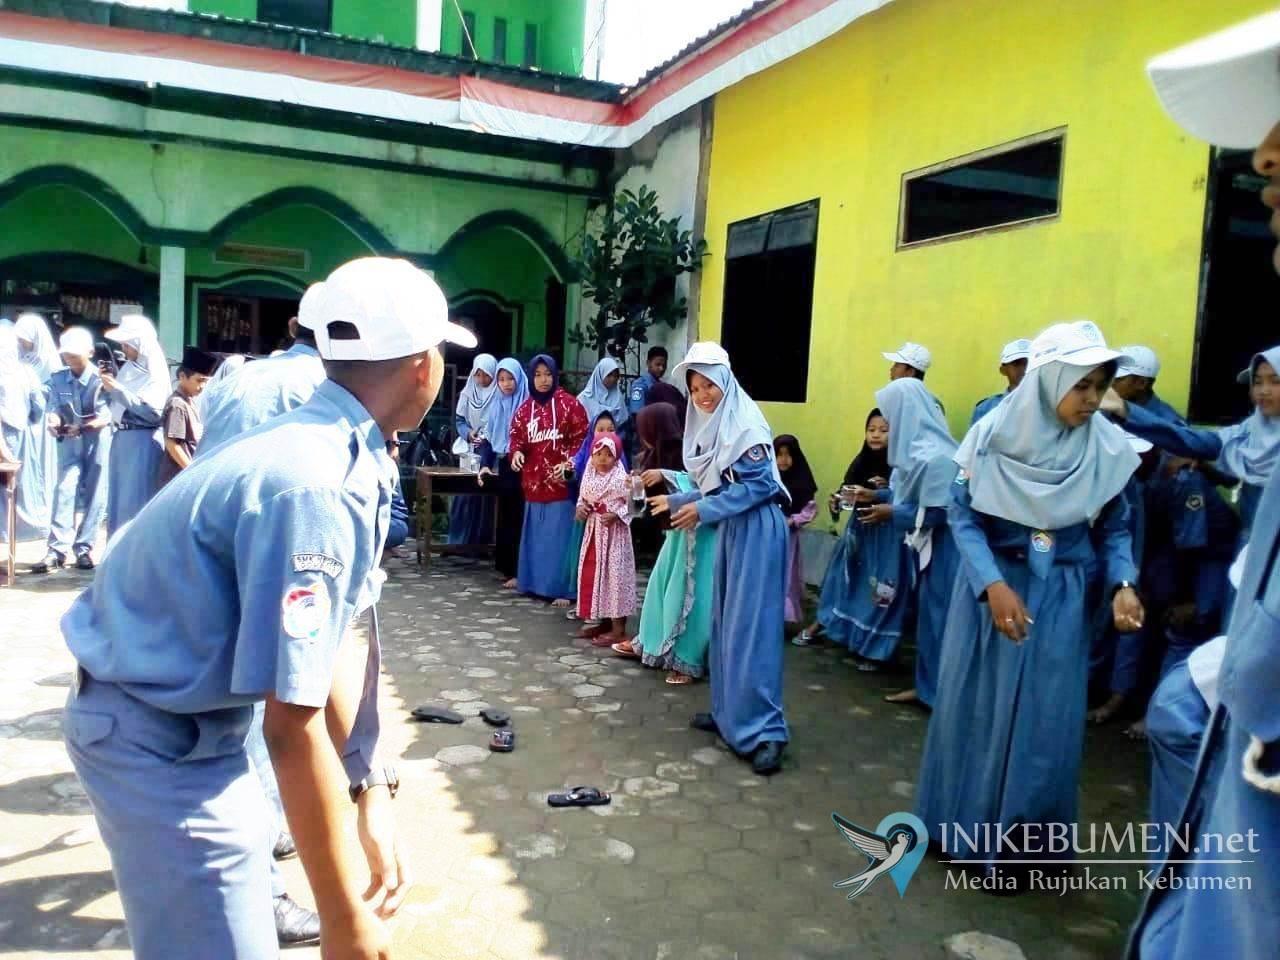 Dikunjungi PKS SMK Negeri 1 Gombong, Anak-anak PAYDT Al Hikmah Ceria